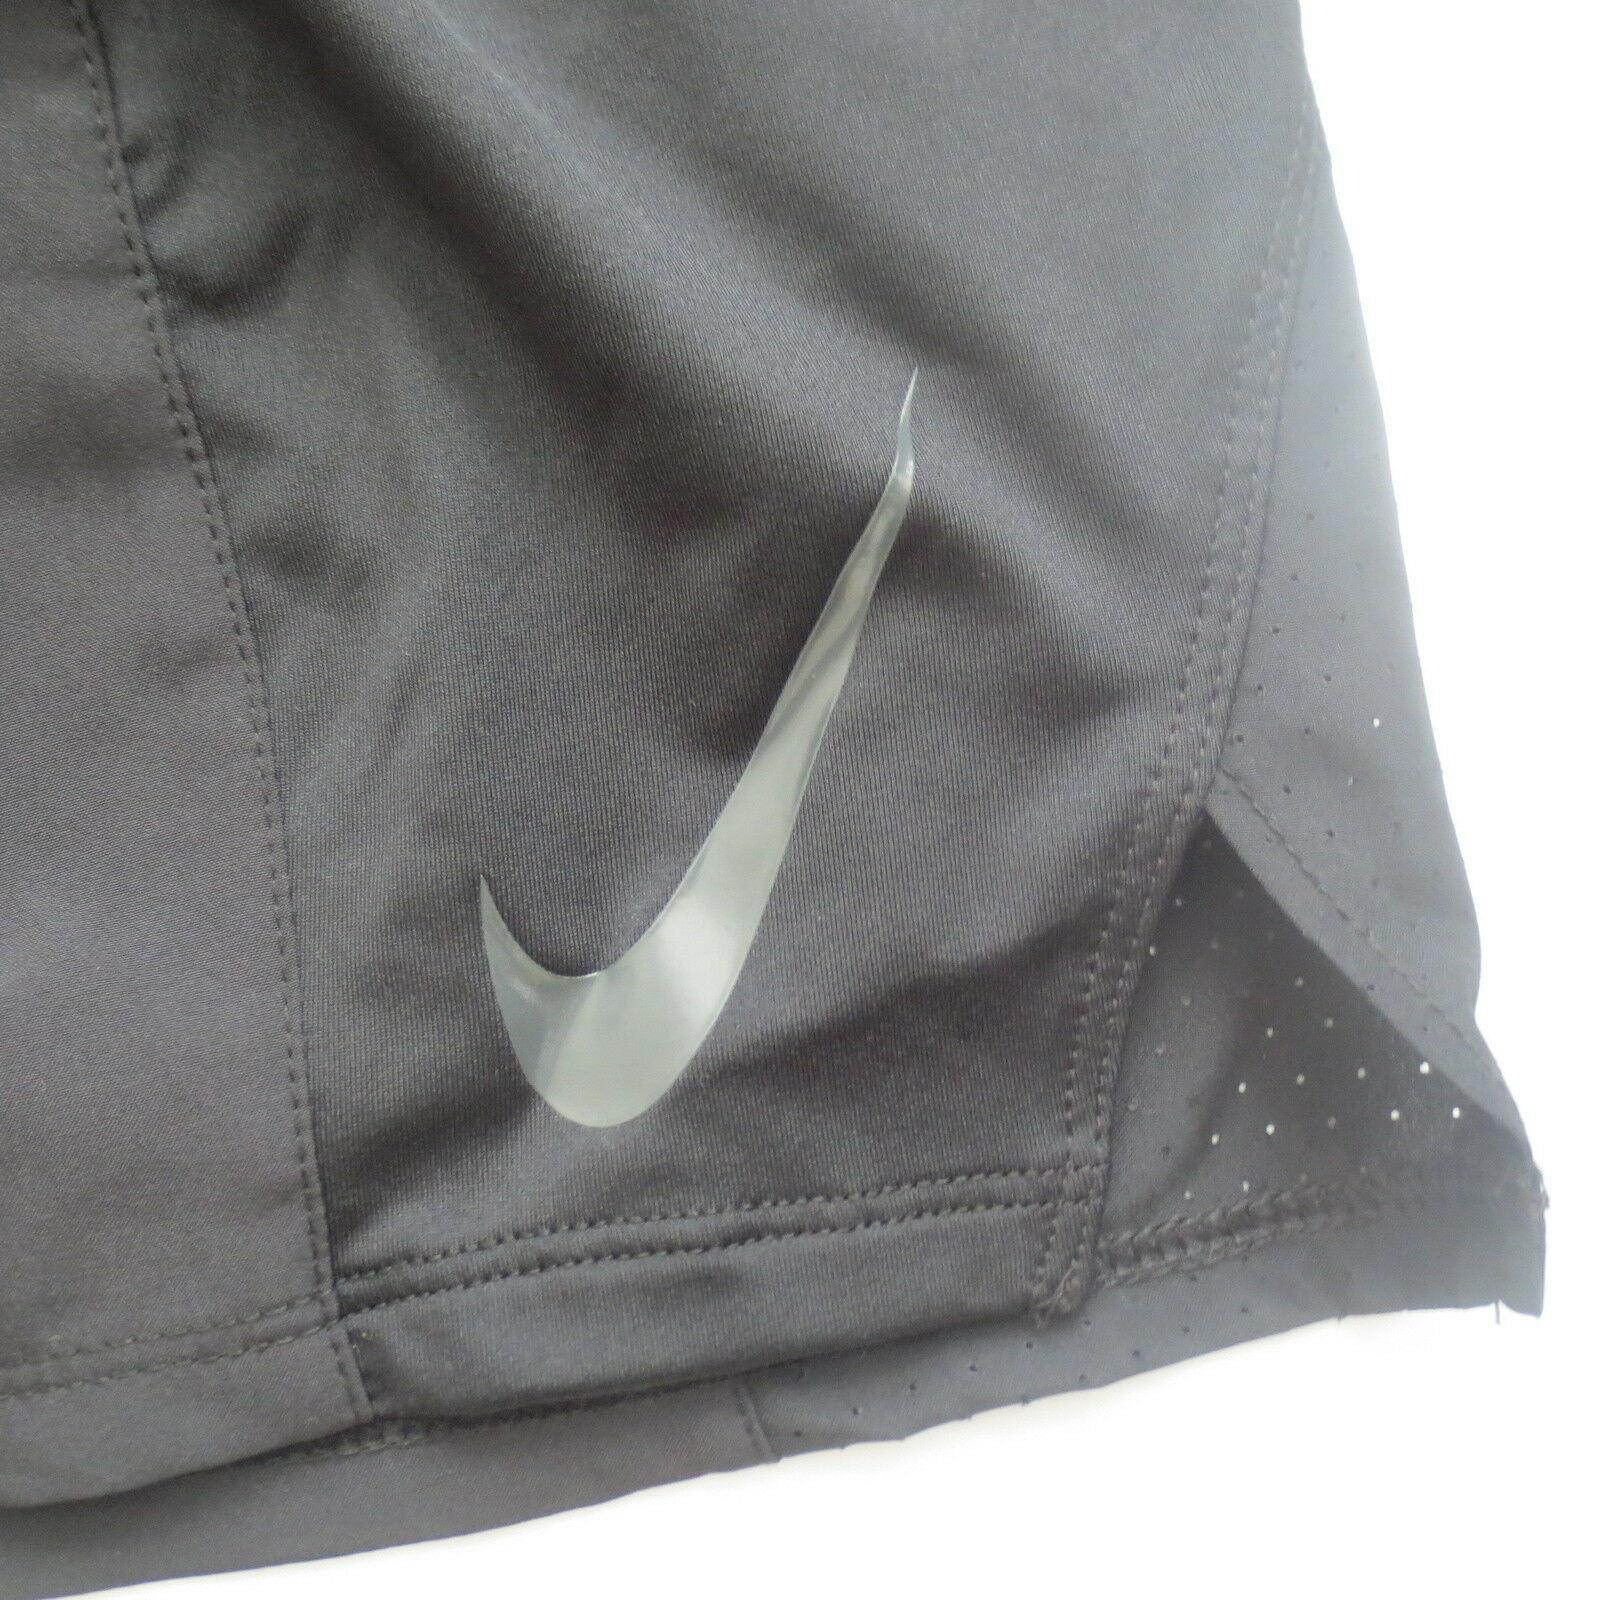 Nike Women Dry Running Shorts - 902281 - Black 010 - Size L -  NWT image 2